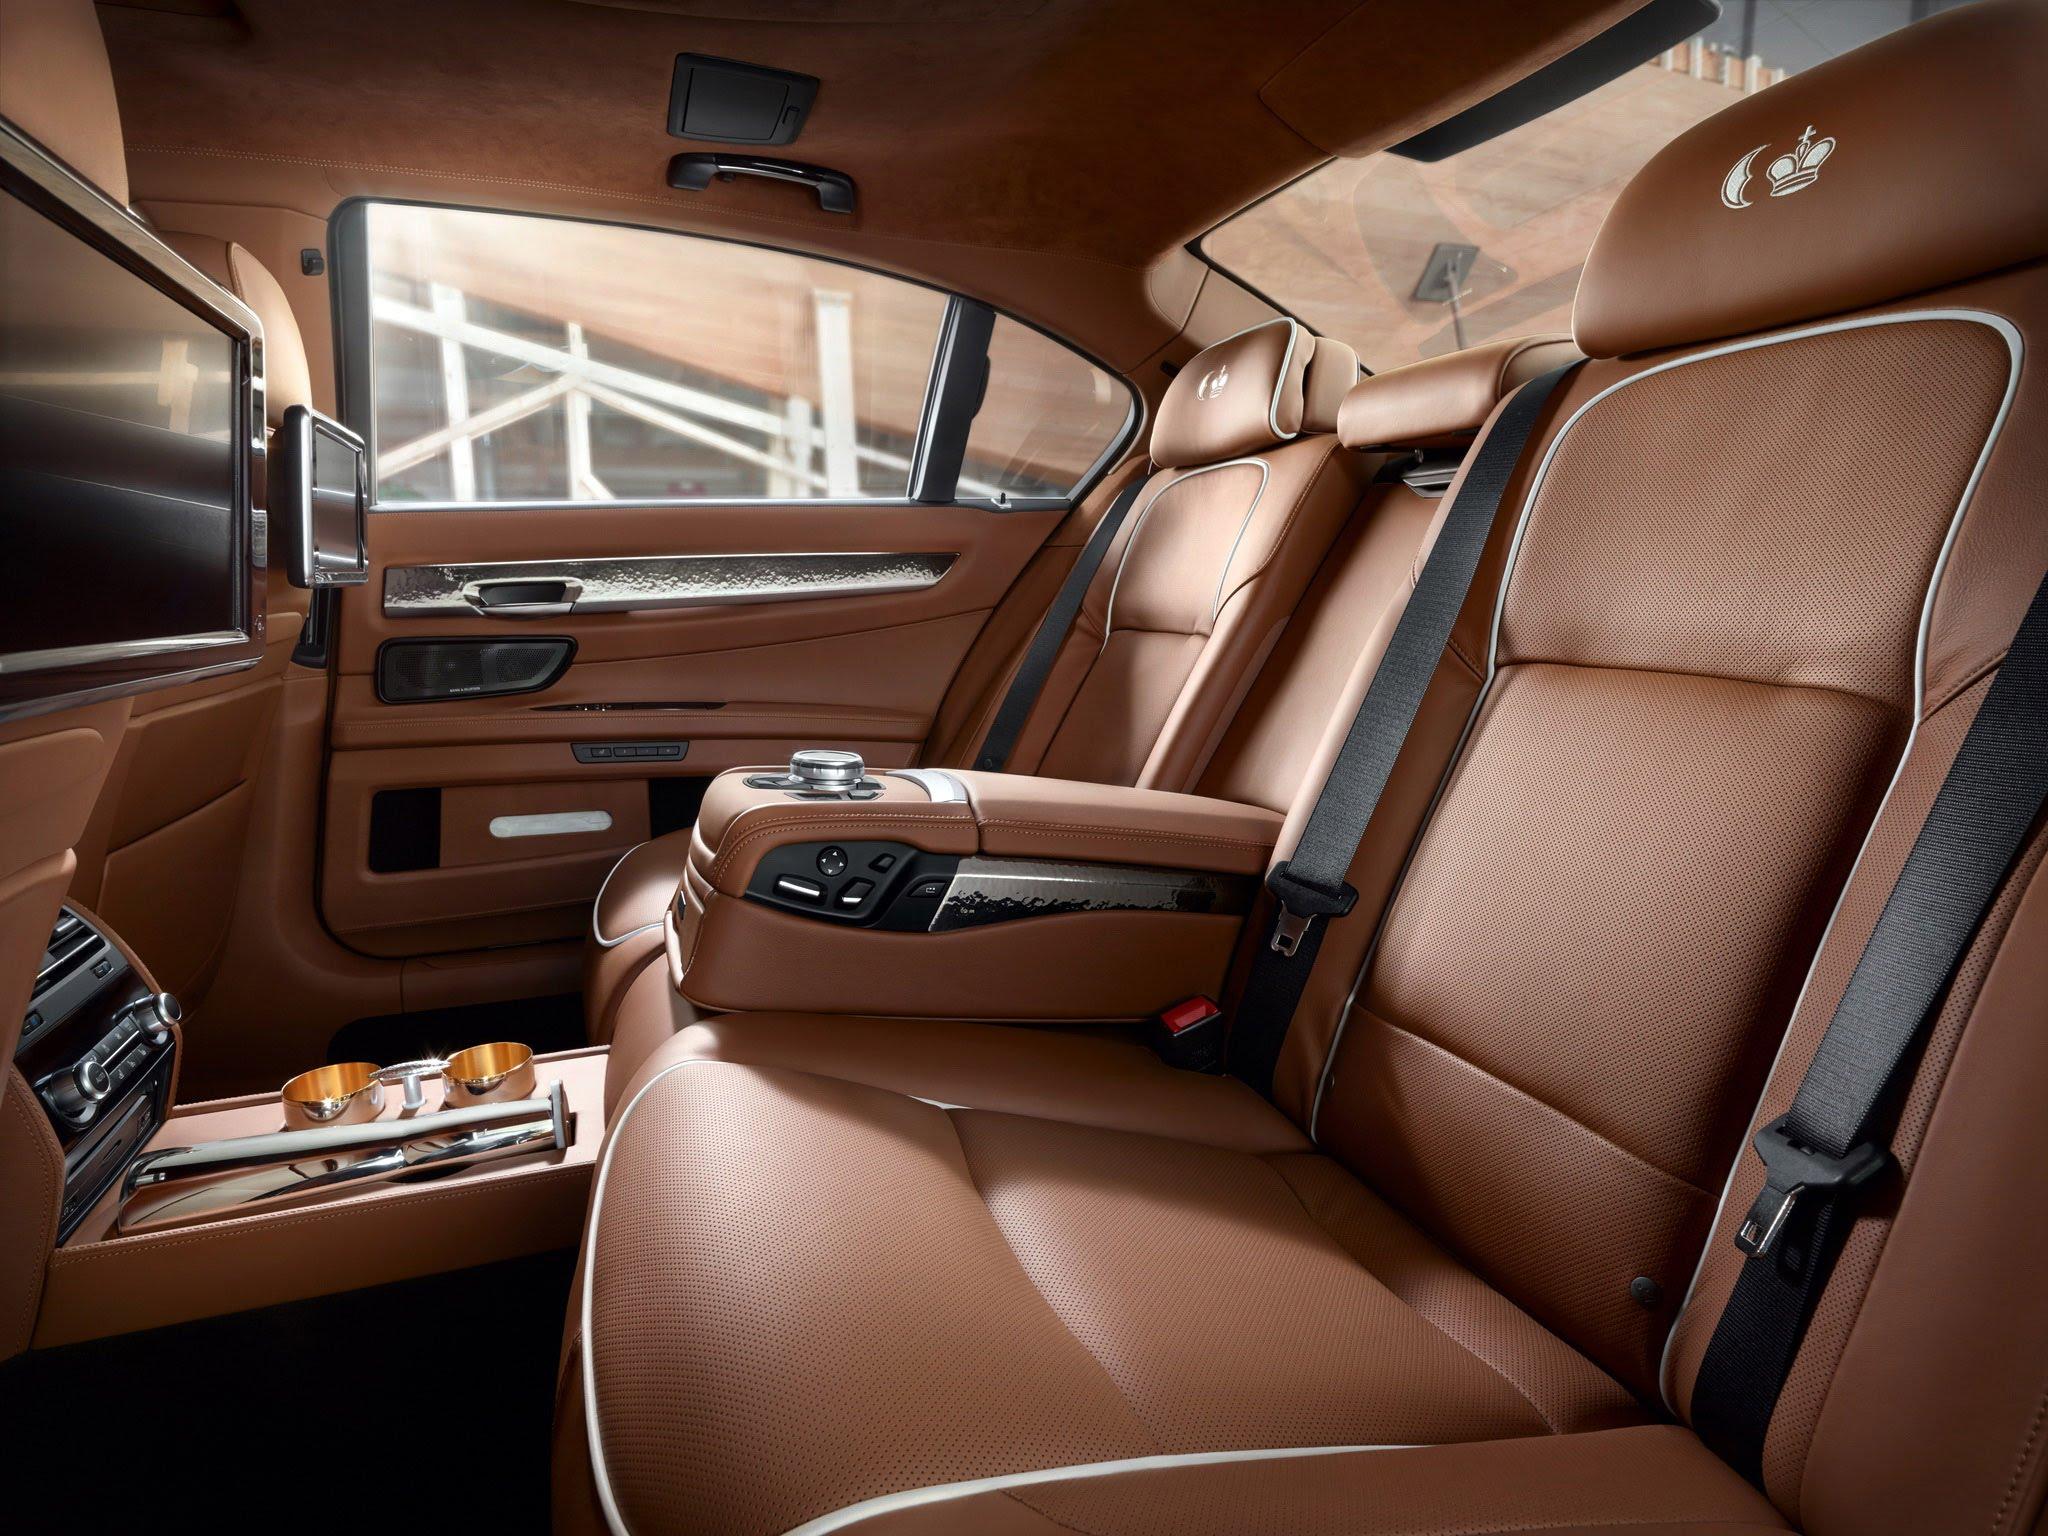 BMW 7 Series Petrol 2016 Interior